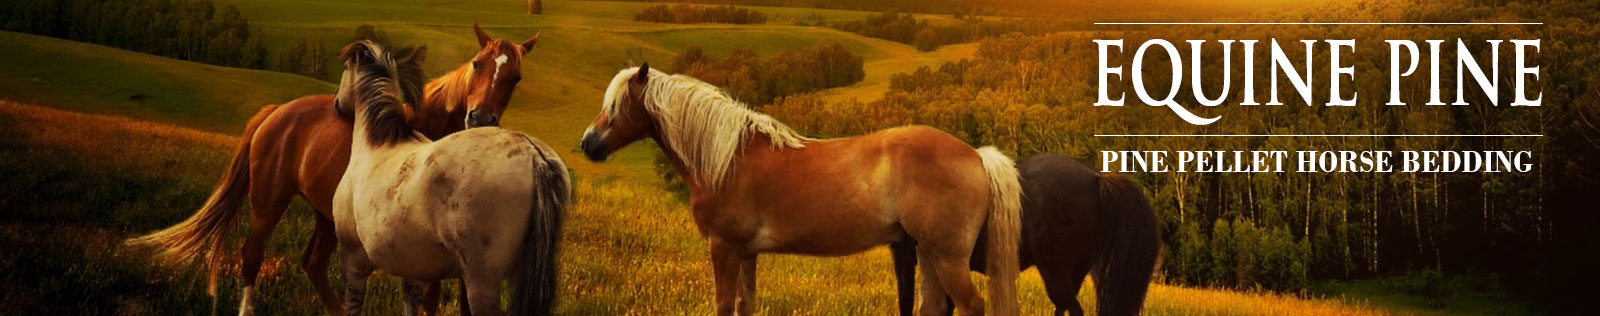 equine pine page header